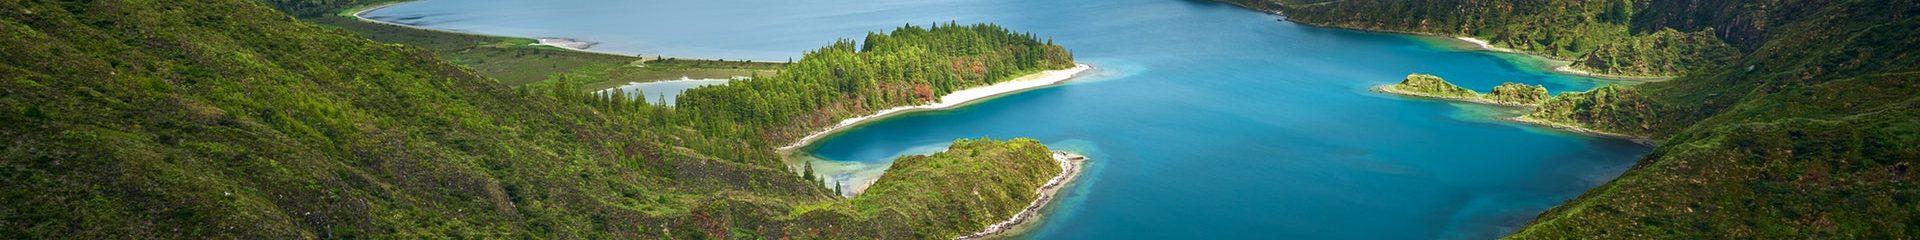 green-mountains-near-blue-lake